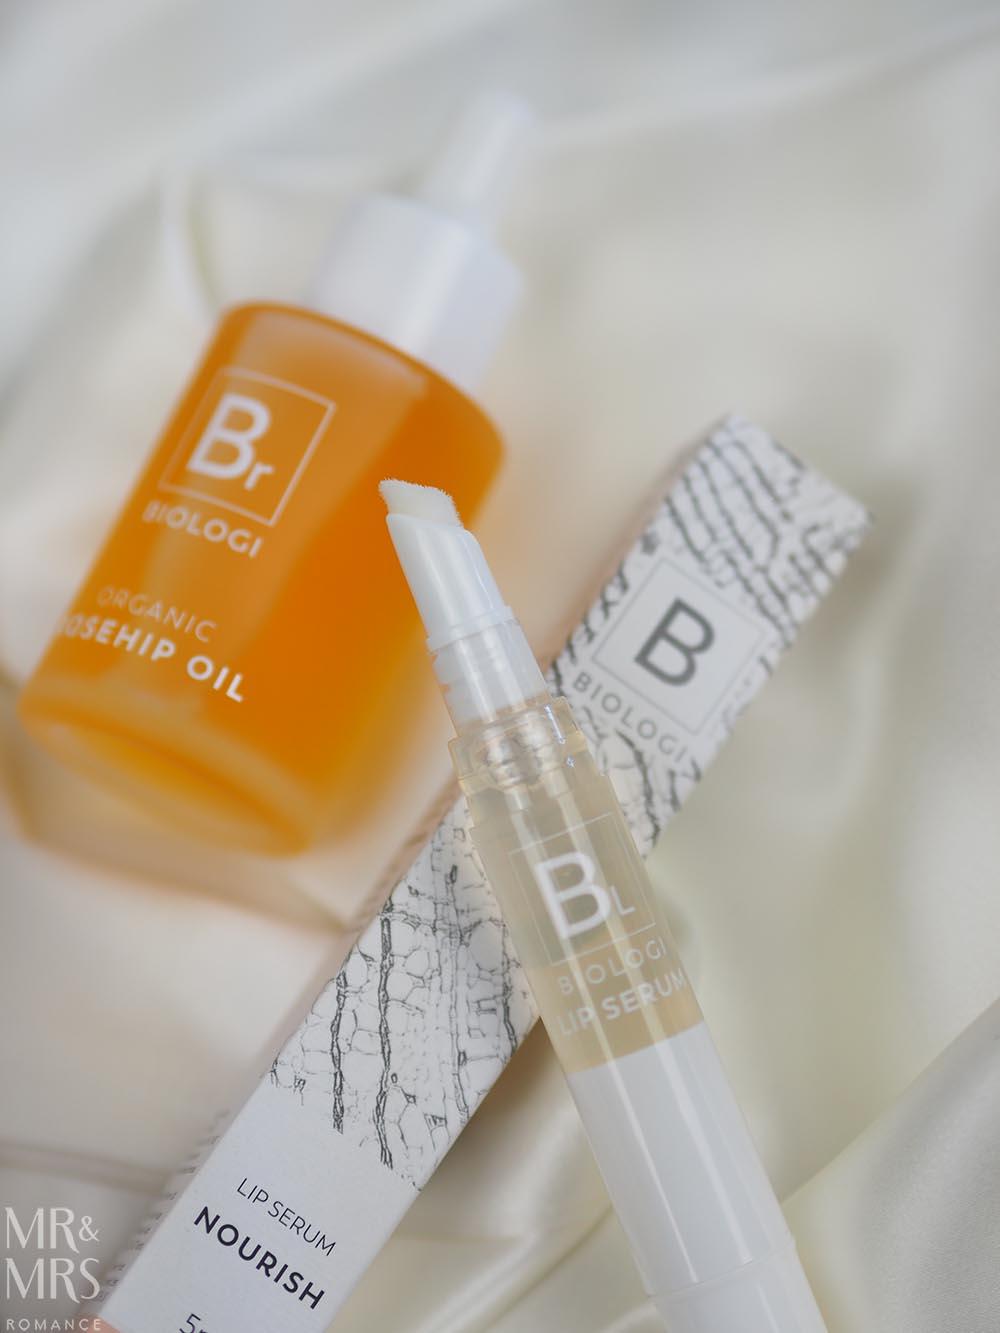 Biolgi -Cosmetics gift ideas